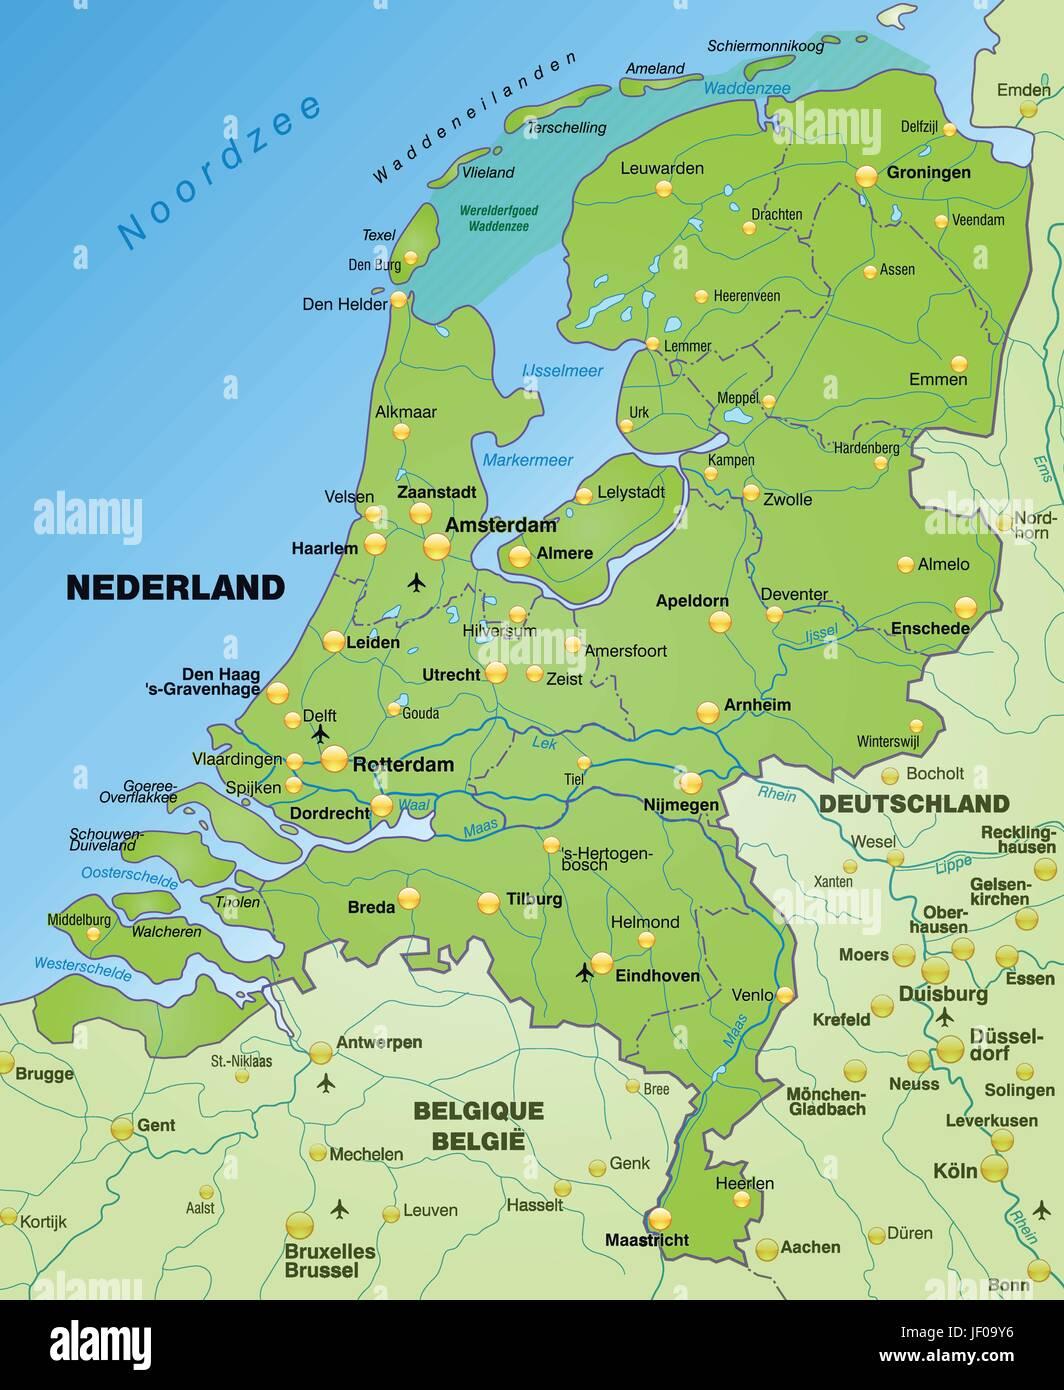 Niederlande Karte Welt.Niederlandekarte Stockfotos Niederlandekarte Bilder Alamy